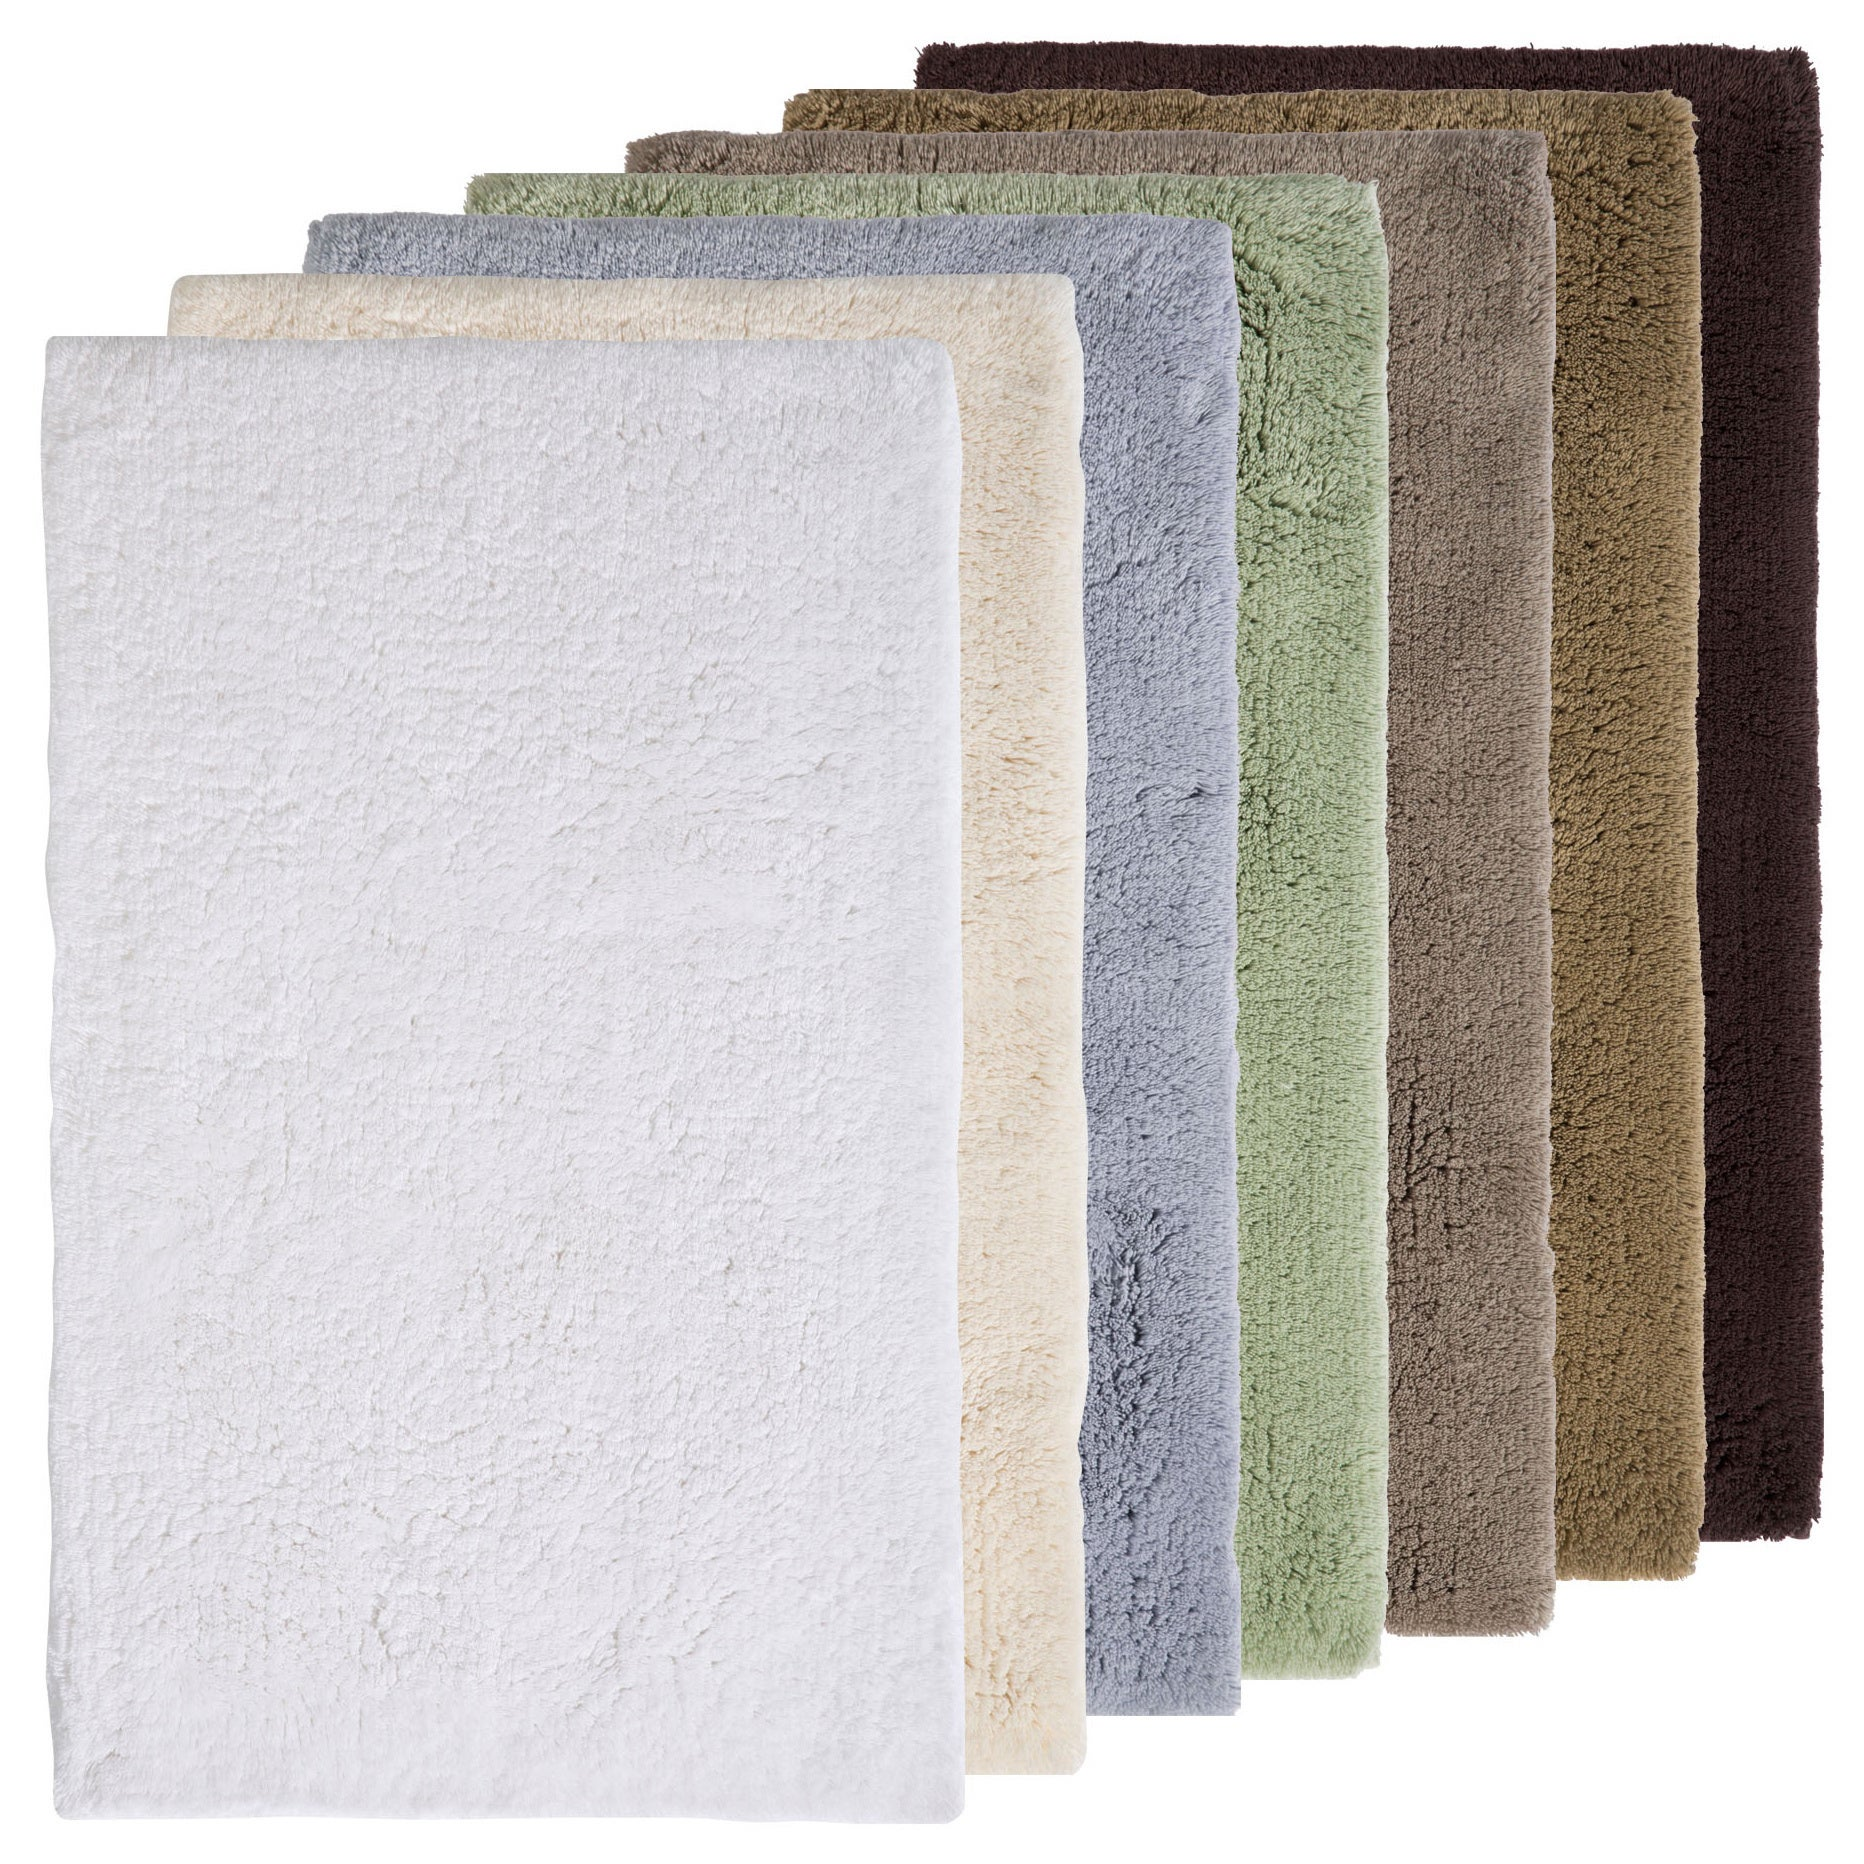 Series Certified Organic Cotton Bath